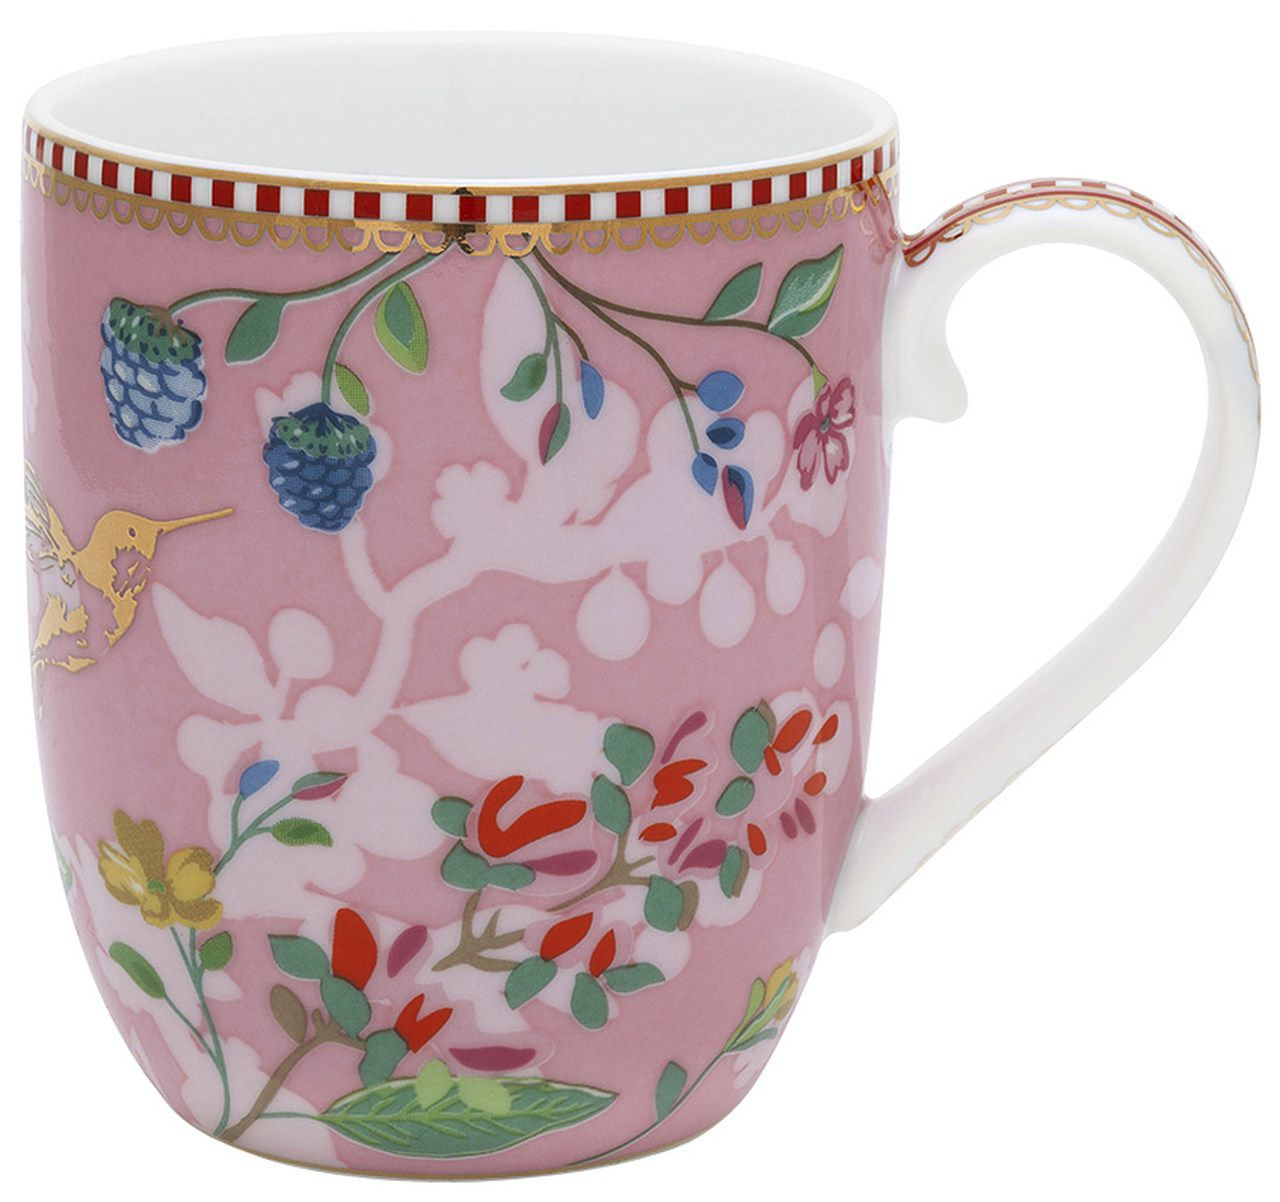 Caneca Pequena Hummingbirds Rosa - Floral - Pip Studio